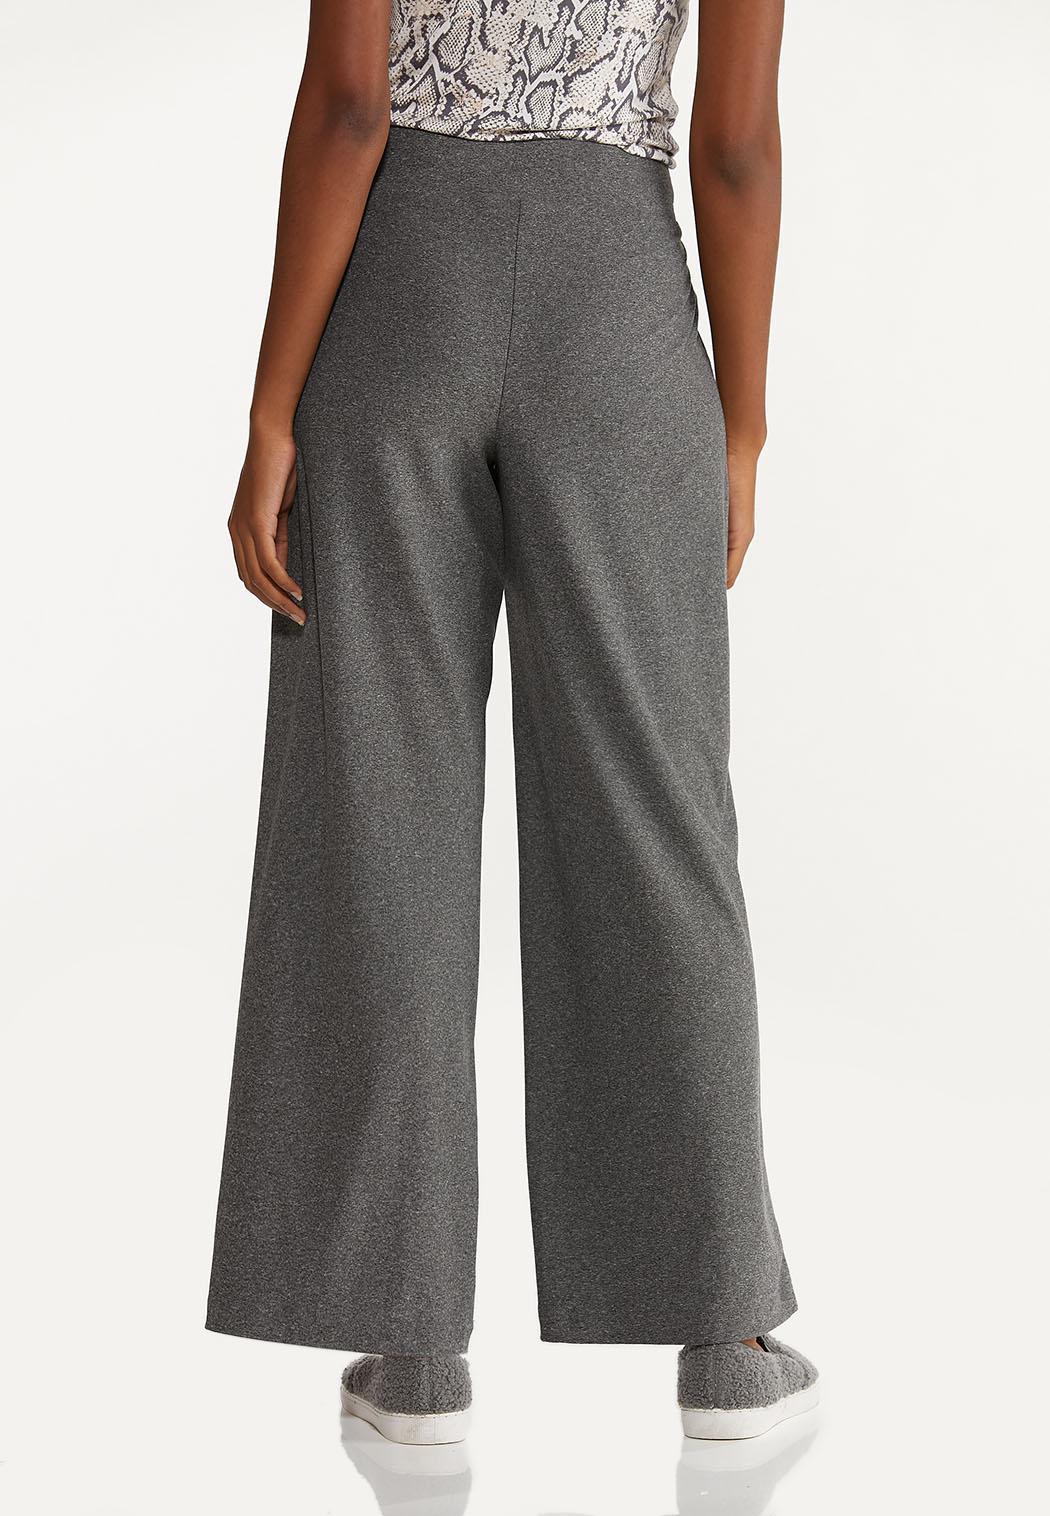 Gray Drawstring Pants (Item #44689236)